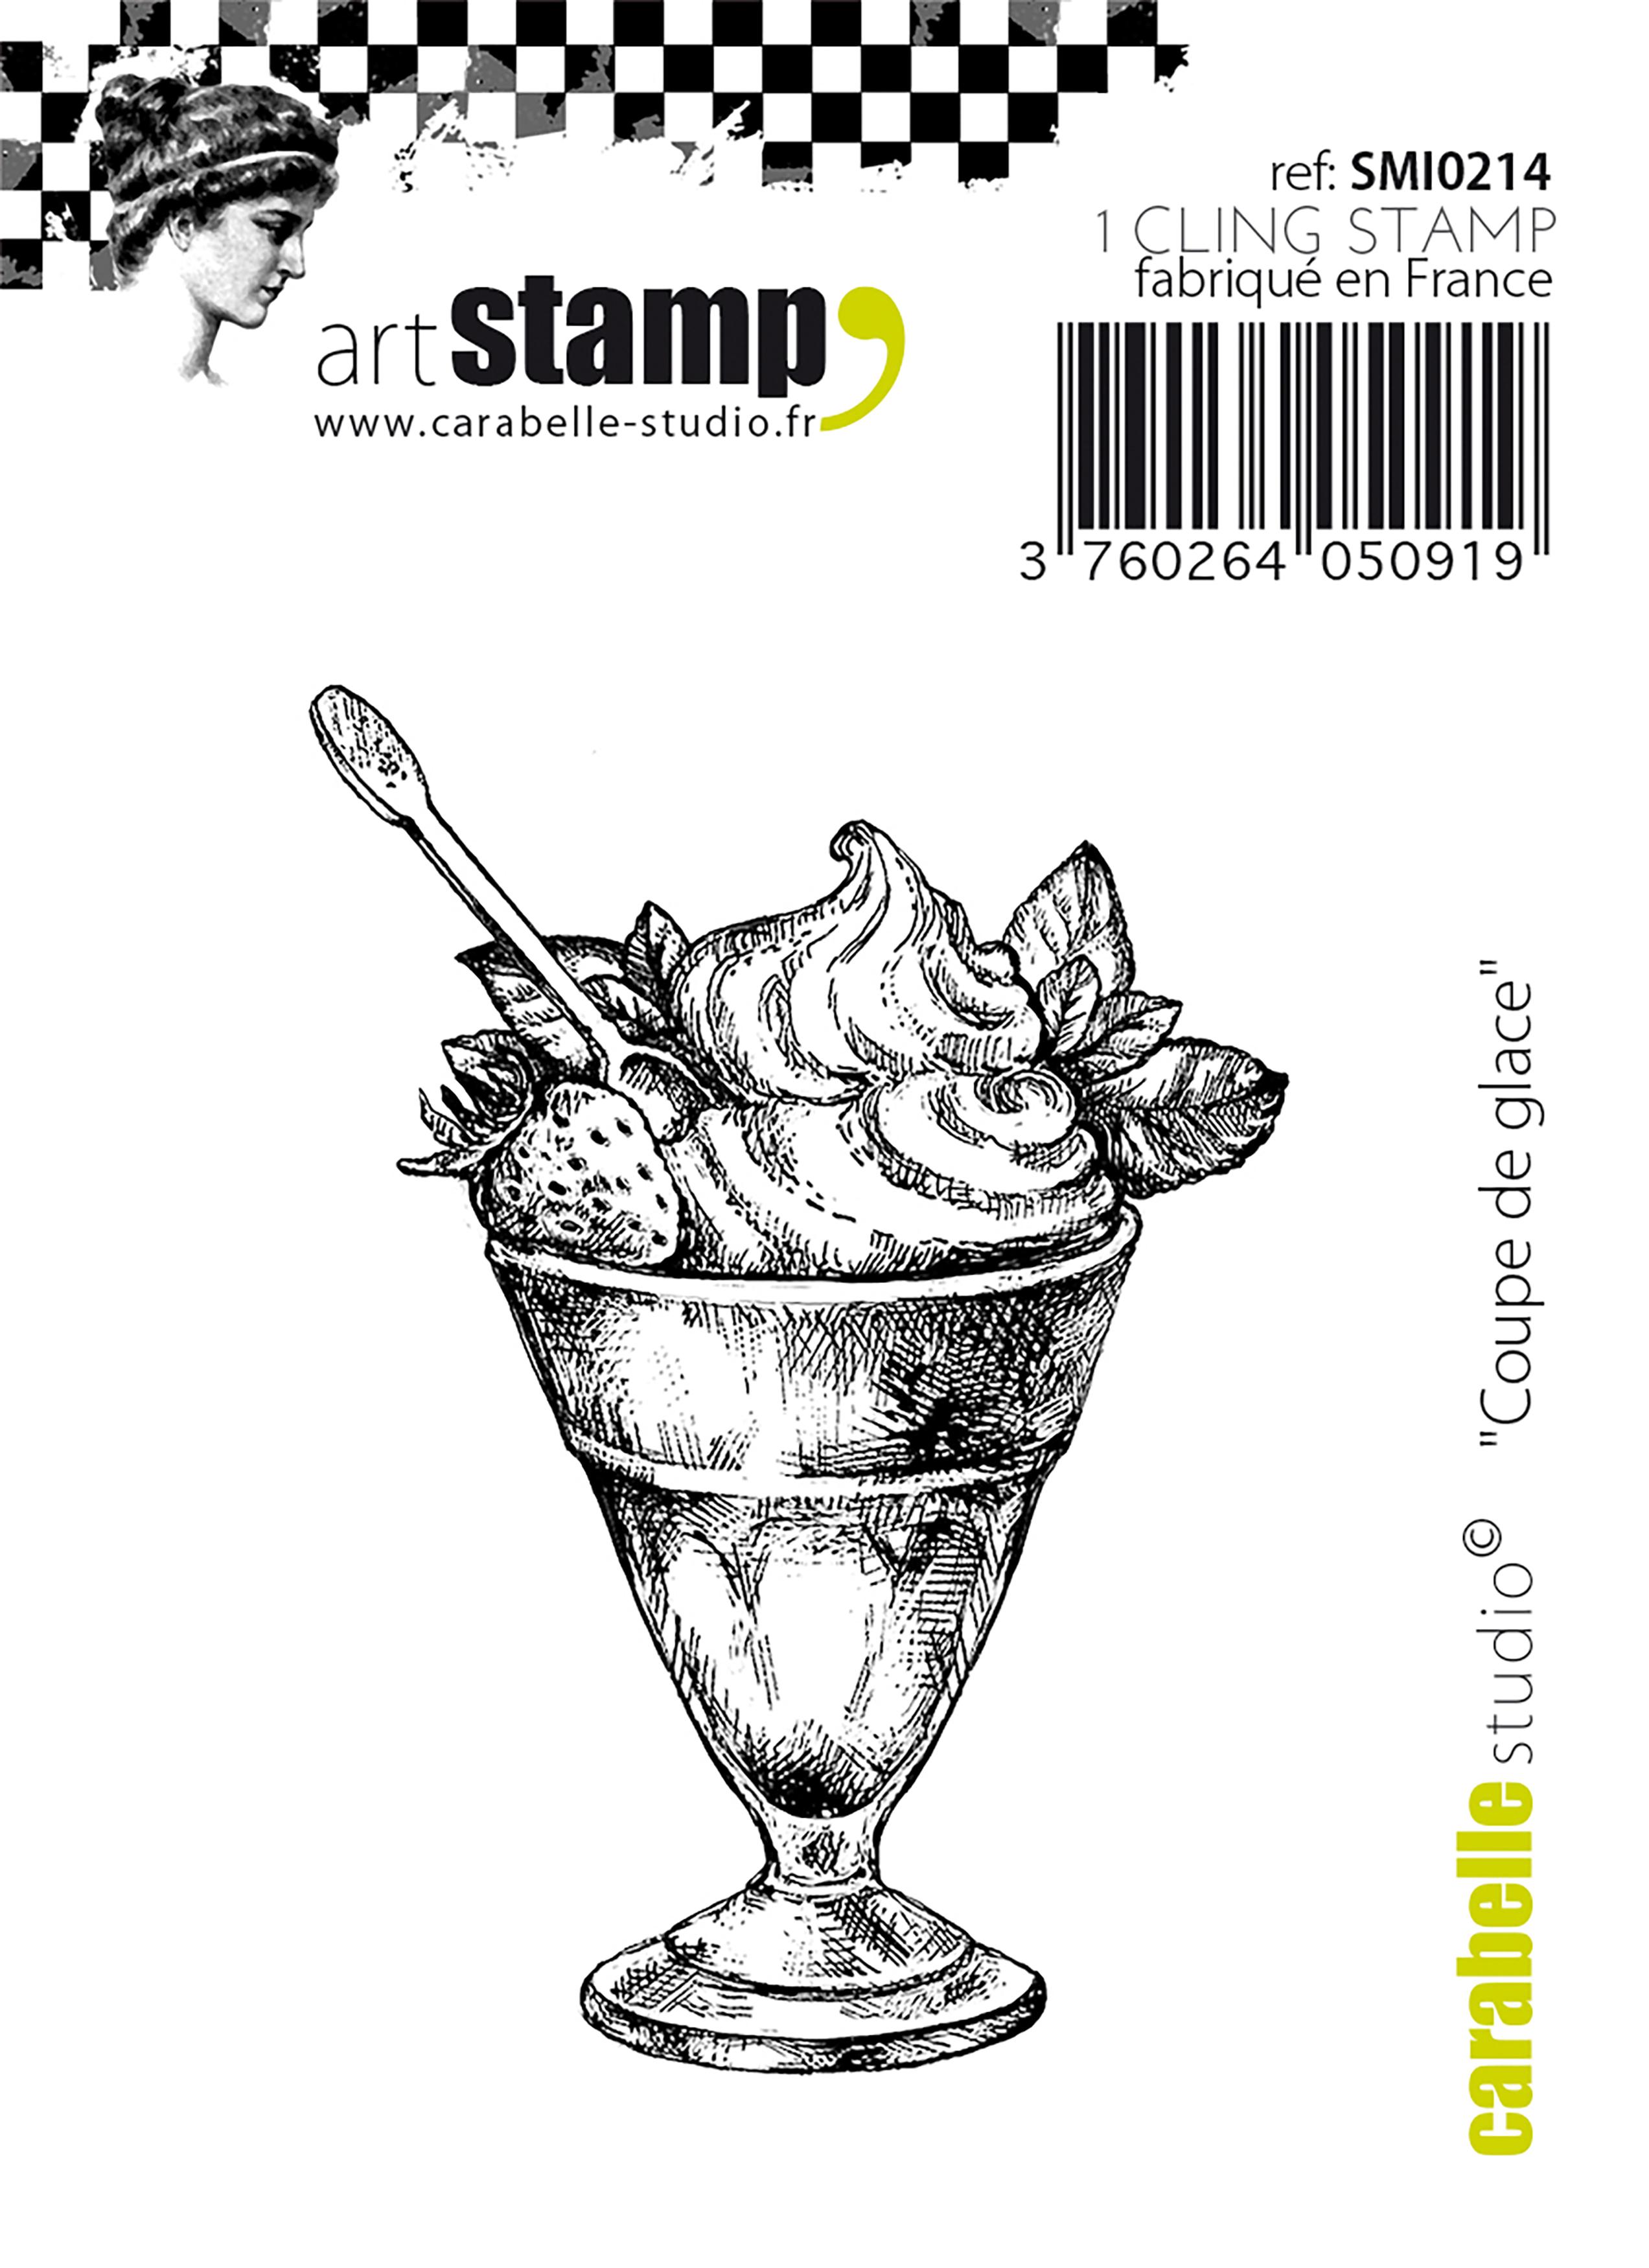 Mini Ice Cream Sundae - Carabelle Studio Cling Stamp Small 2.56